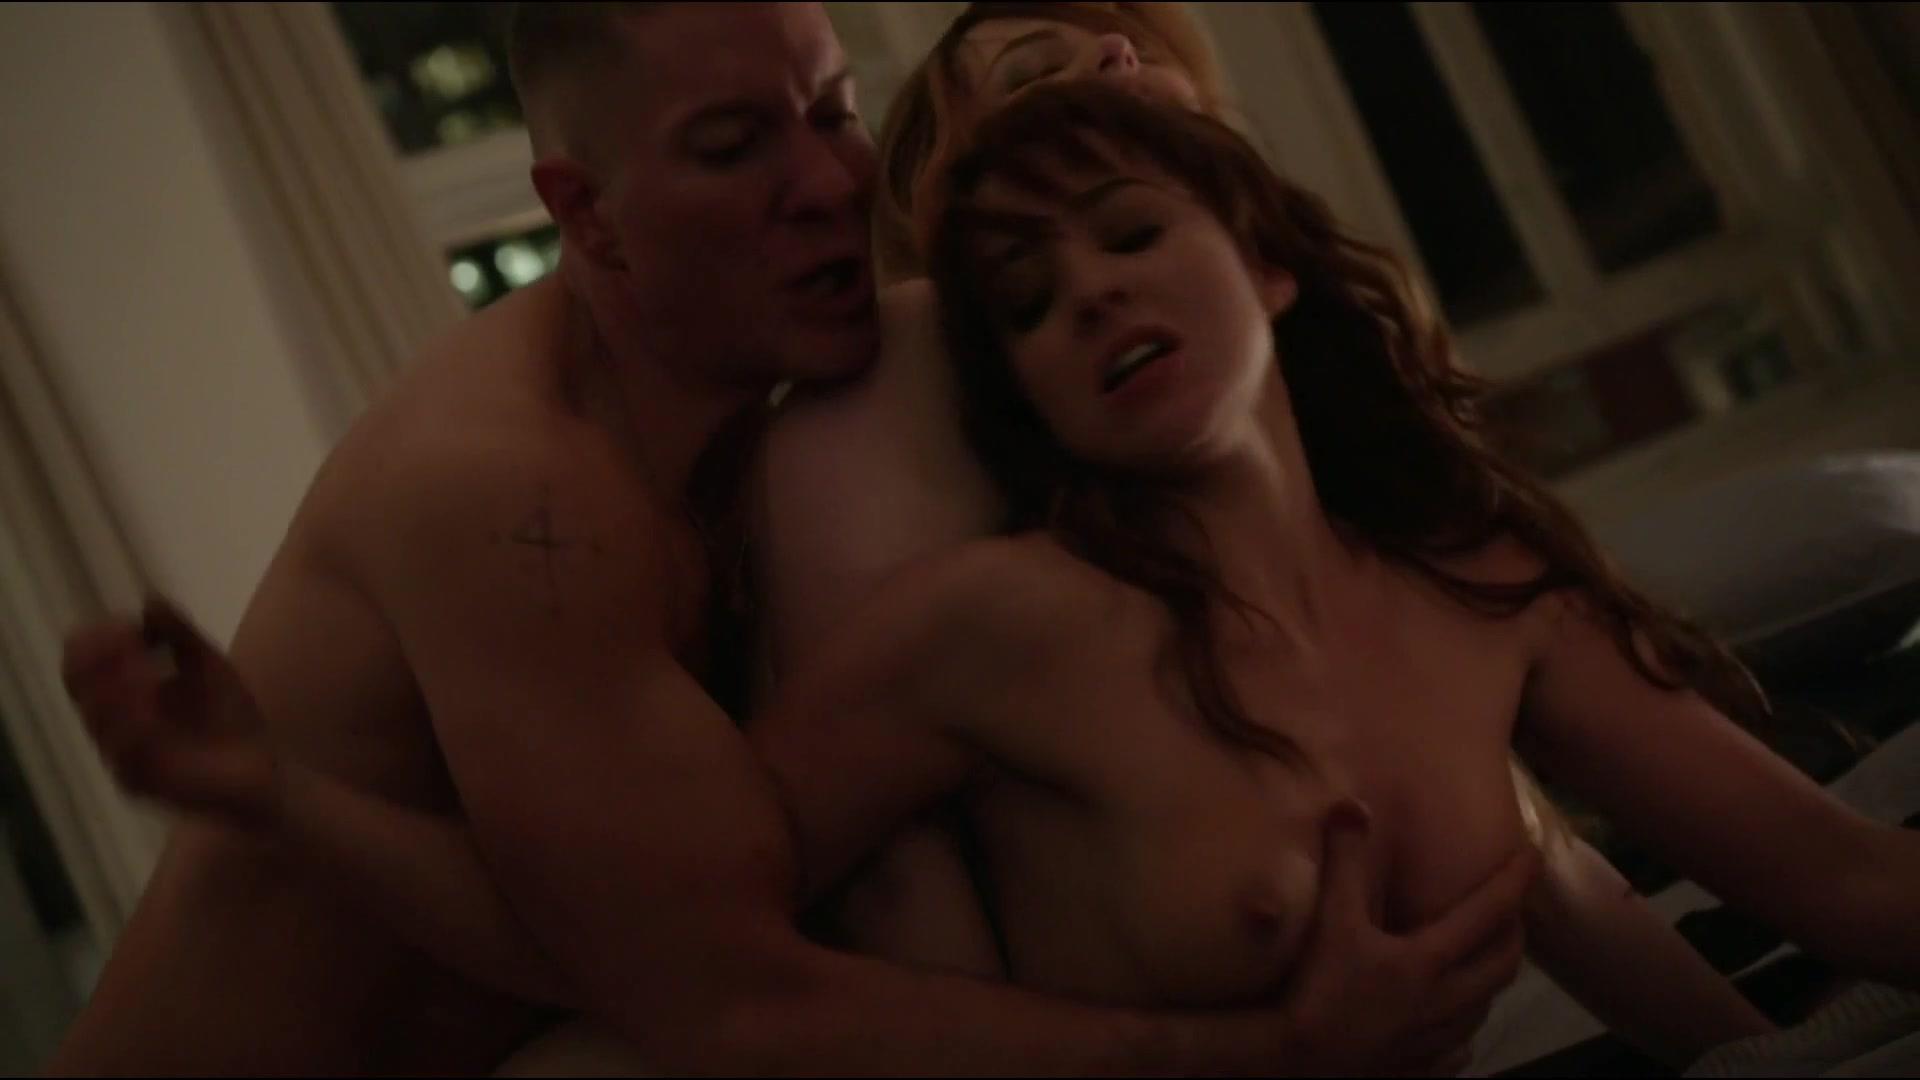 Celebrity Leaked Sex Tape